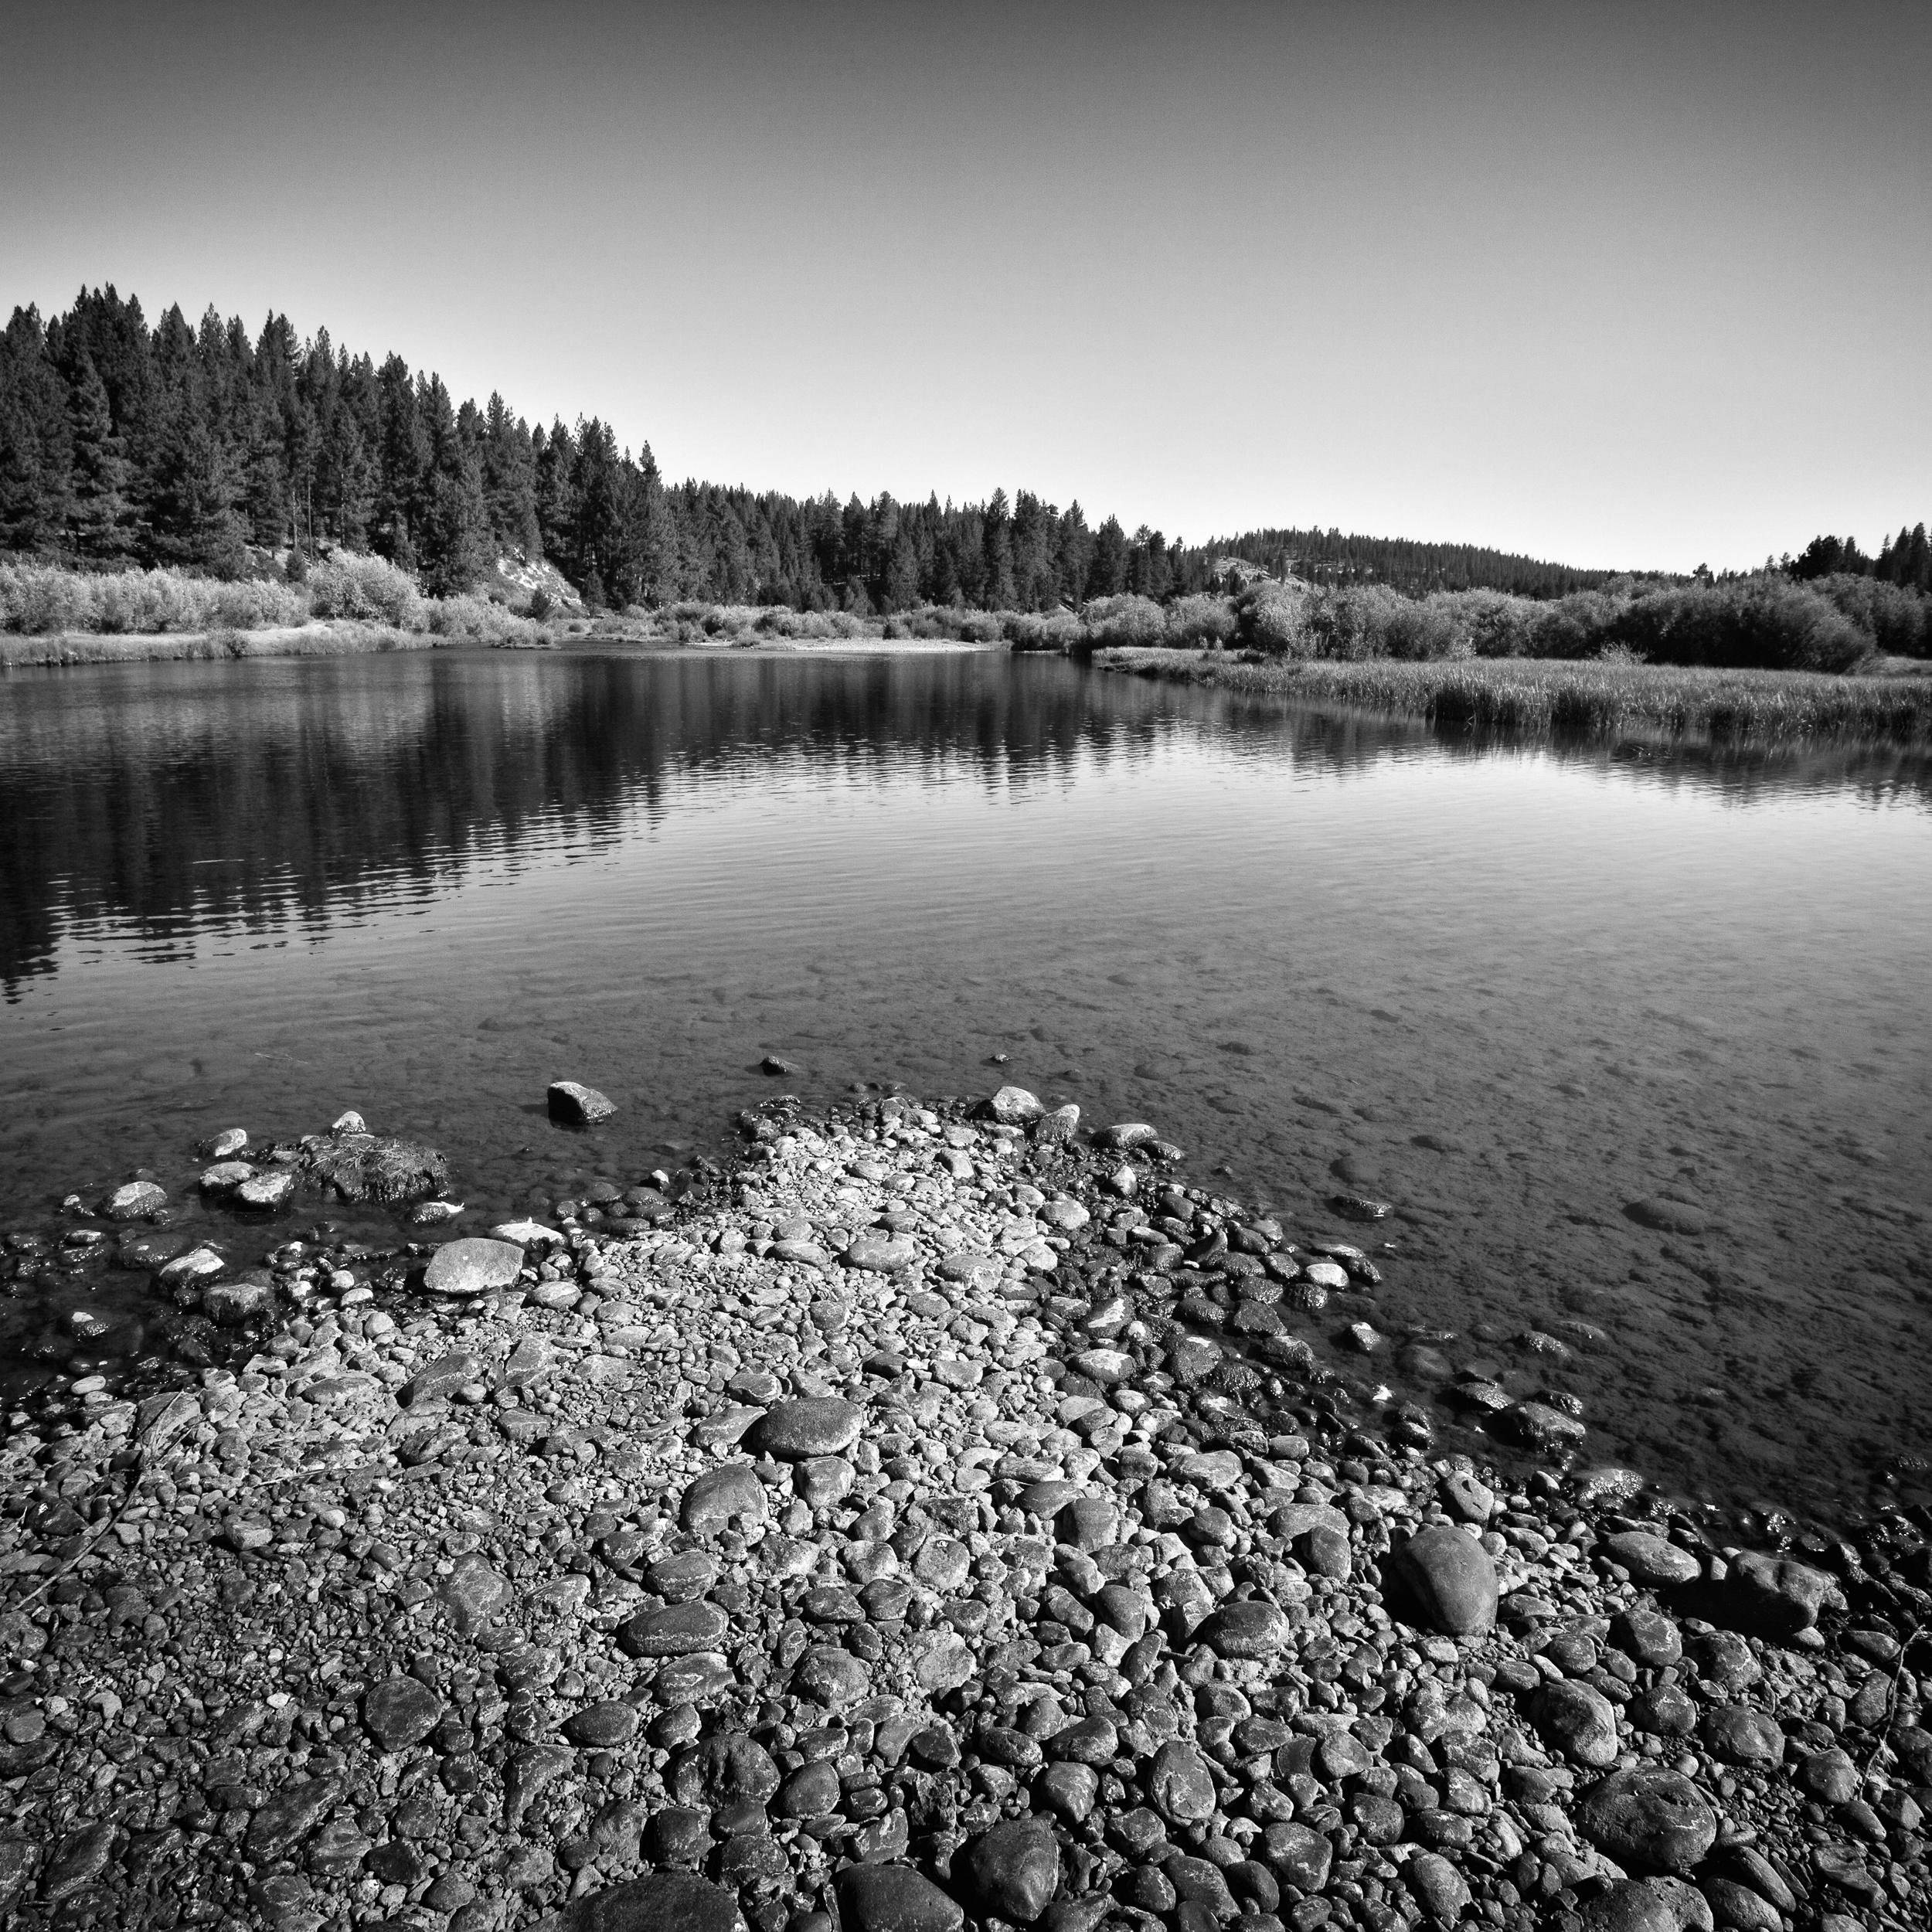 Flat, Little Truckee River